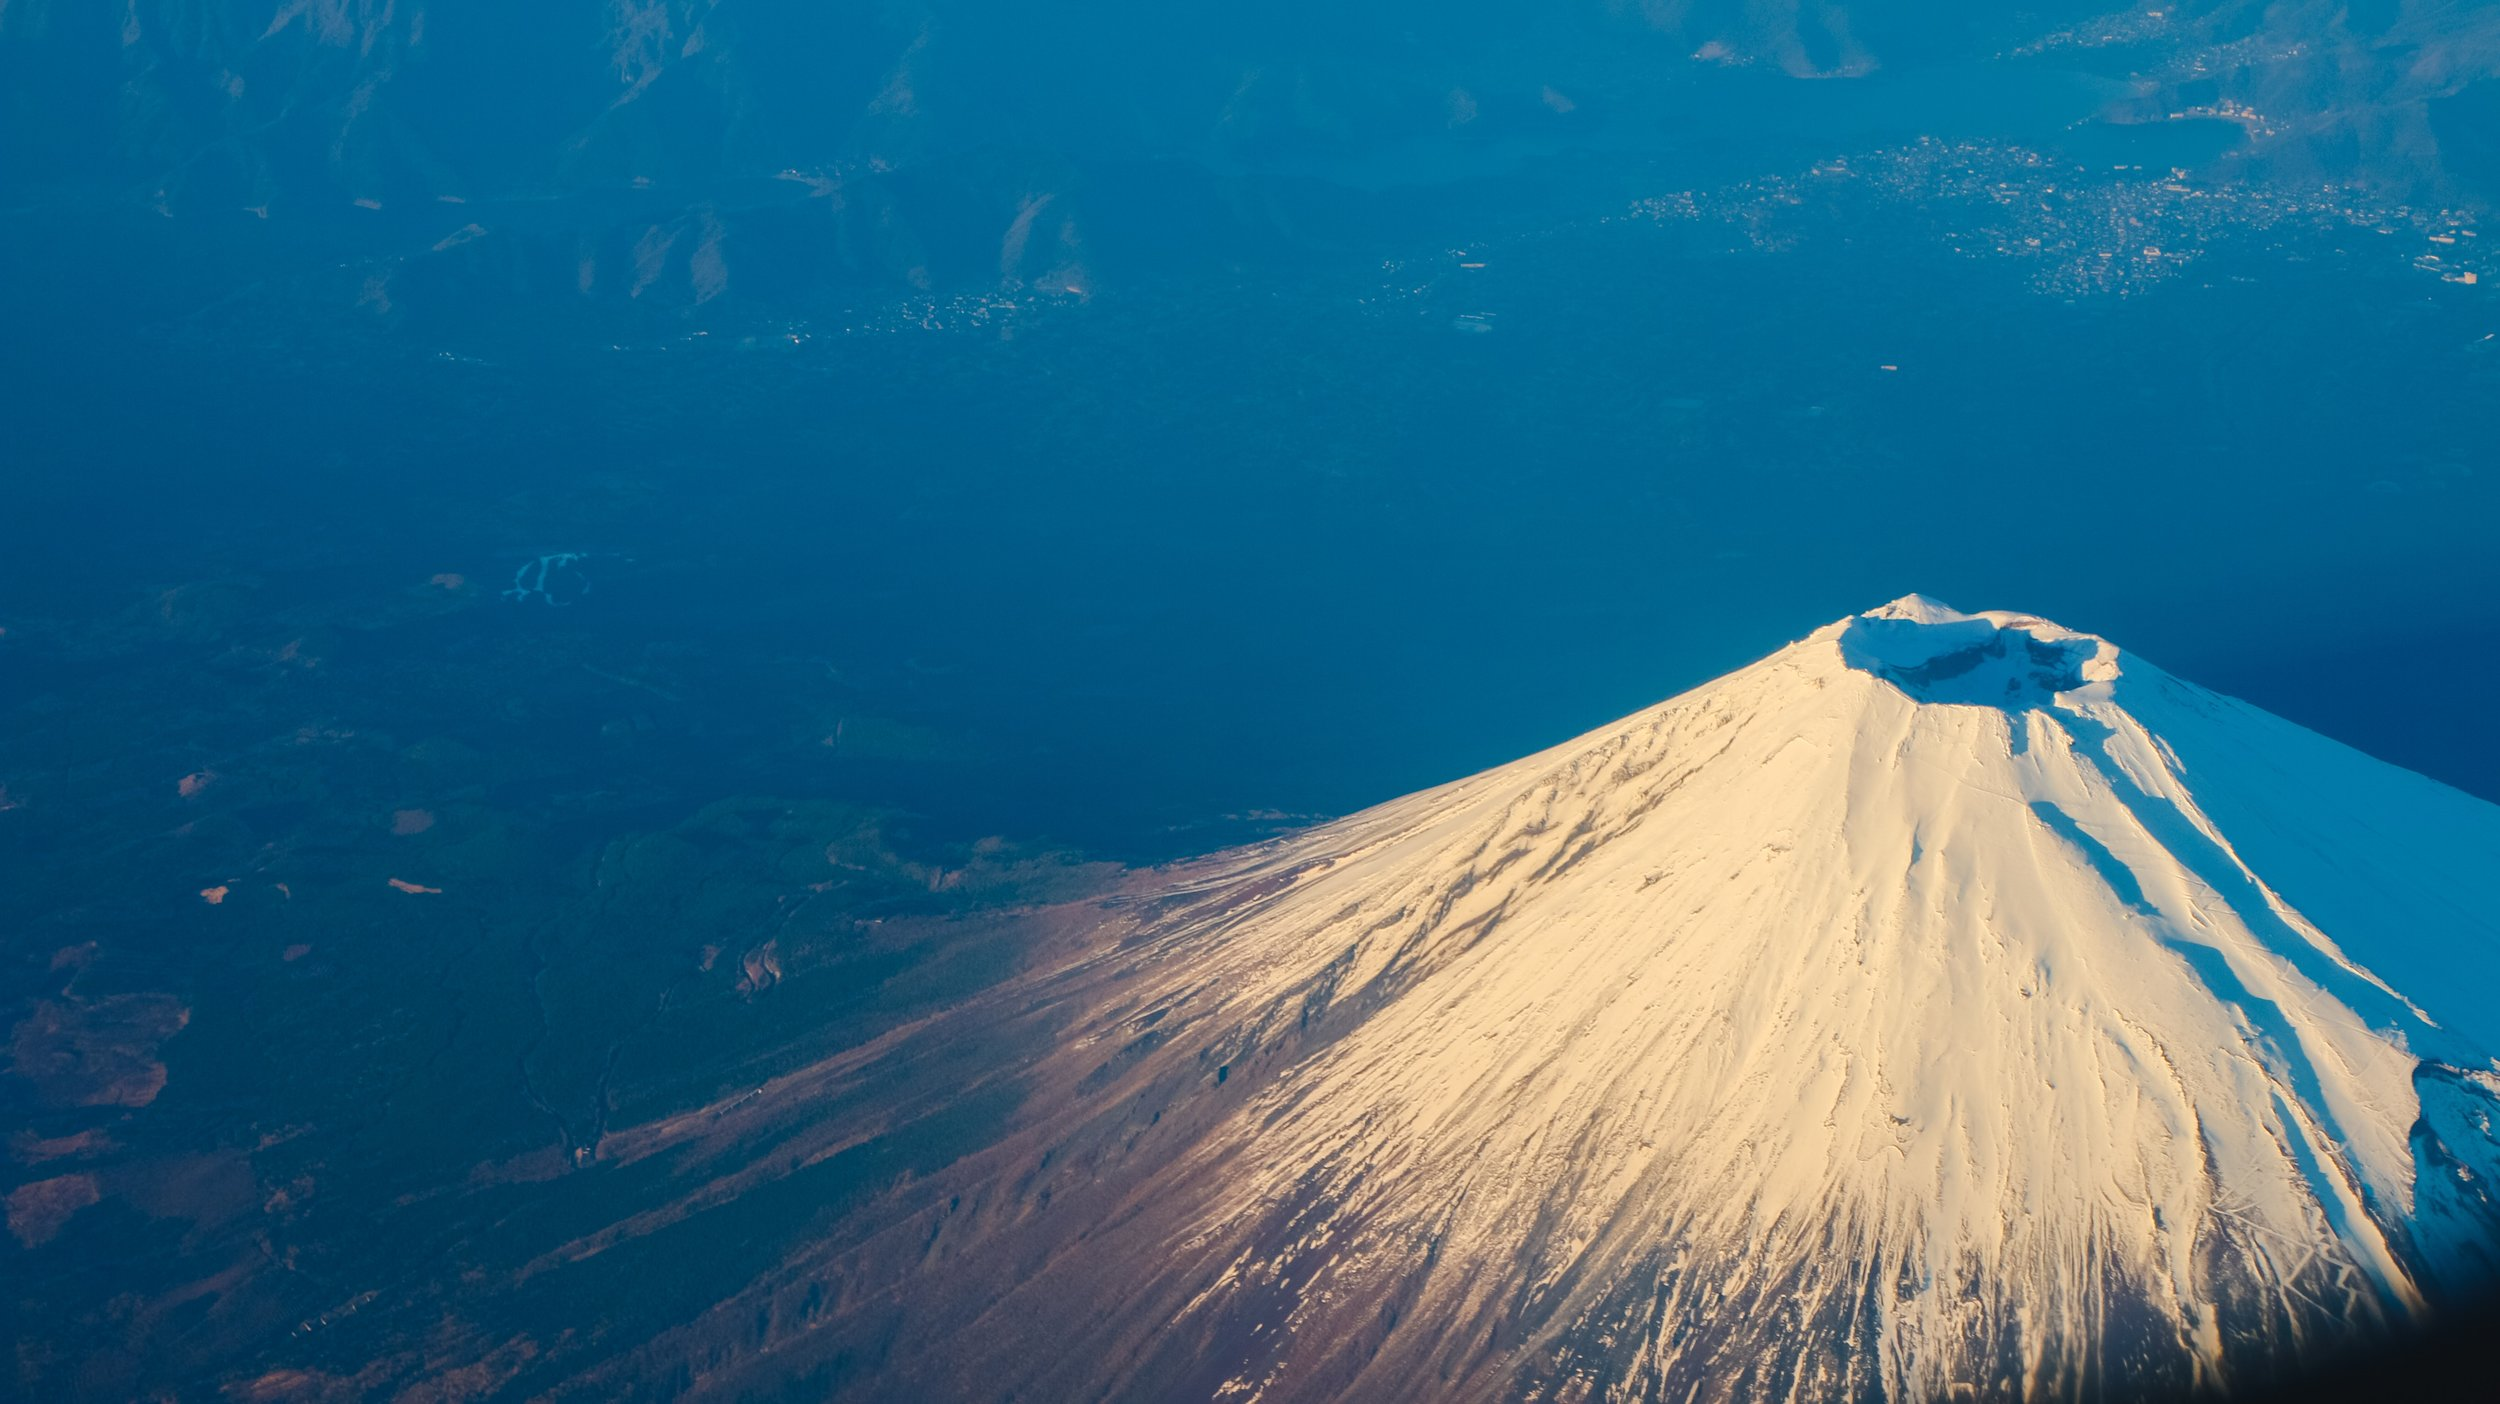 【SKY TREKで再発見 !】 上空3000mから撮影する富士山の魅力